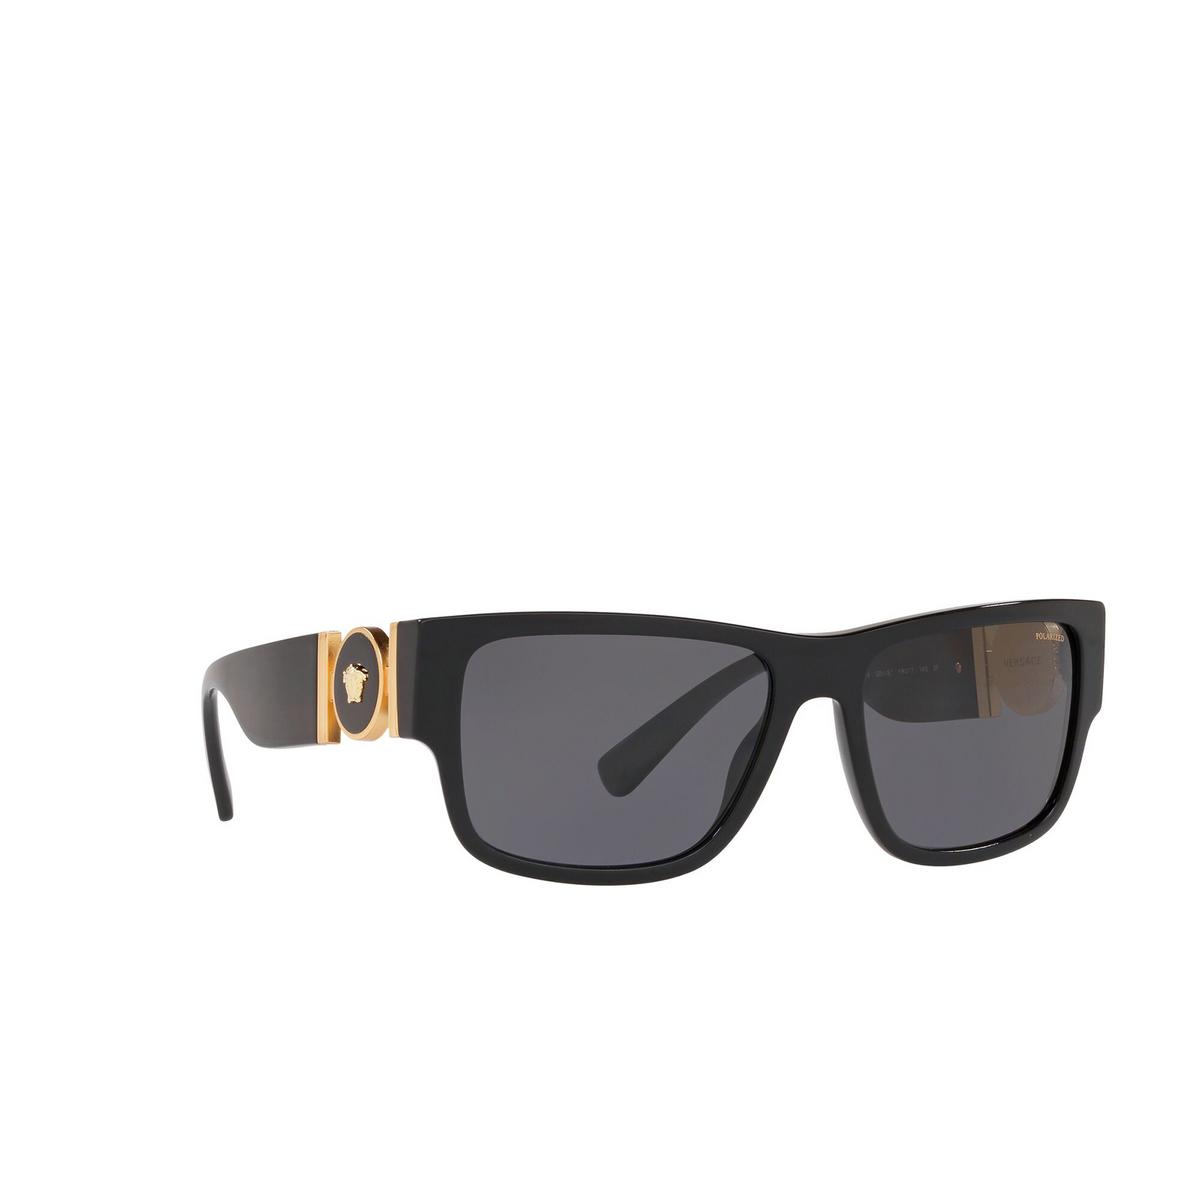 Versace® Square Sunglasses: VE4369 color Black GB1/81 - three-quarters view.